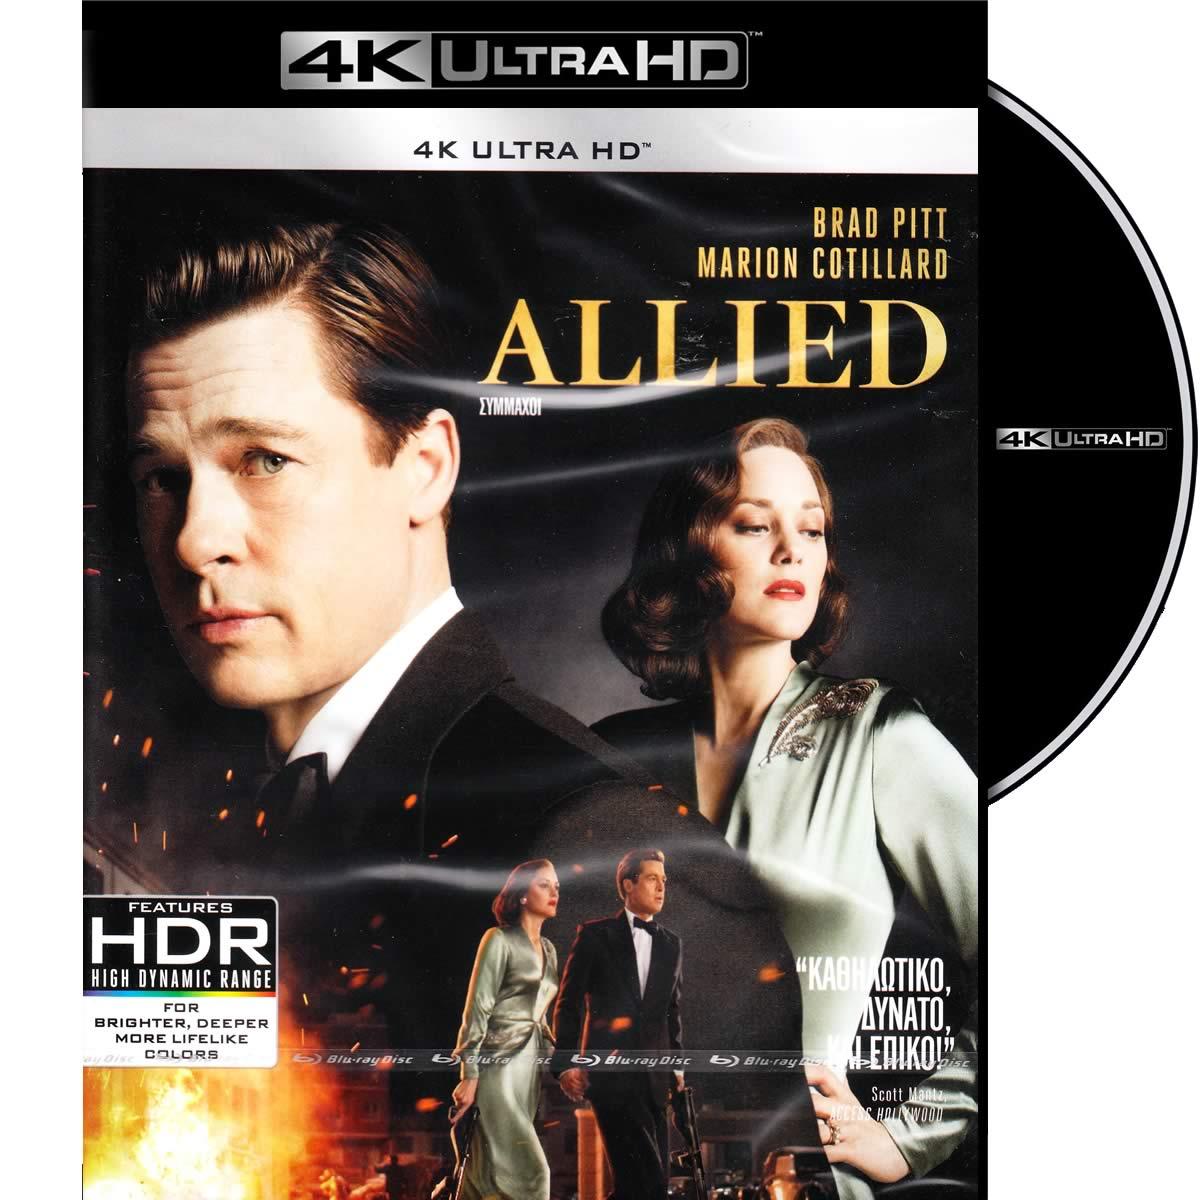 ALLIED_4K UHD BLU-RAY_gr.jpg